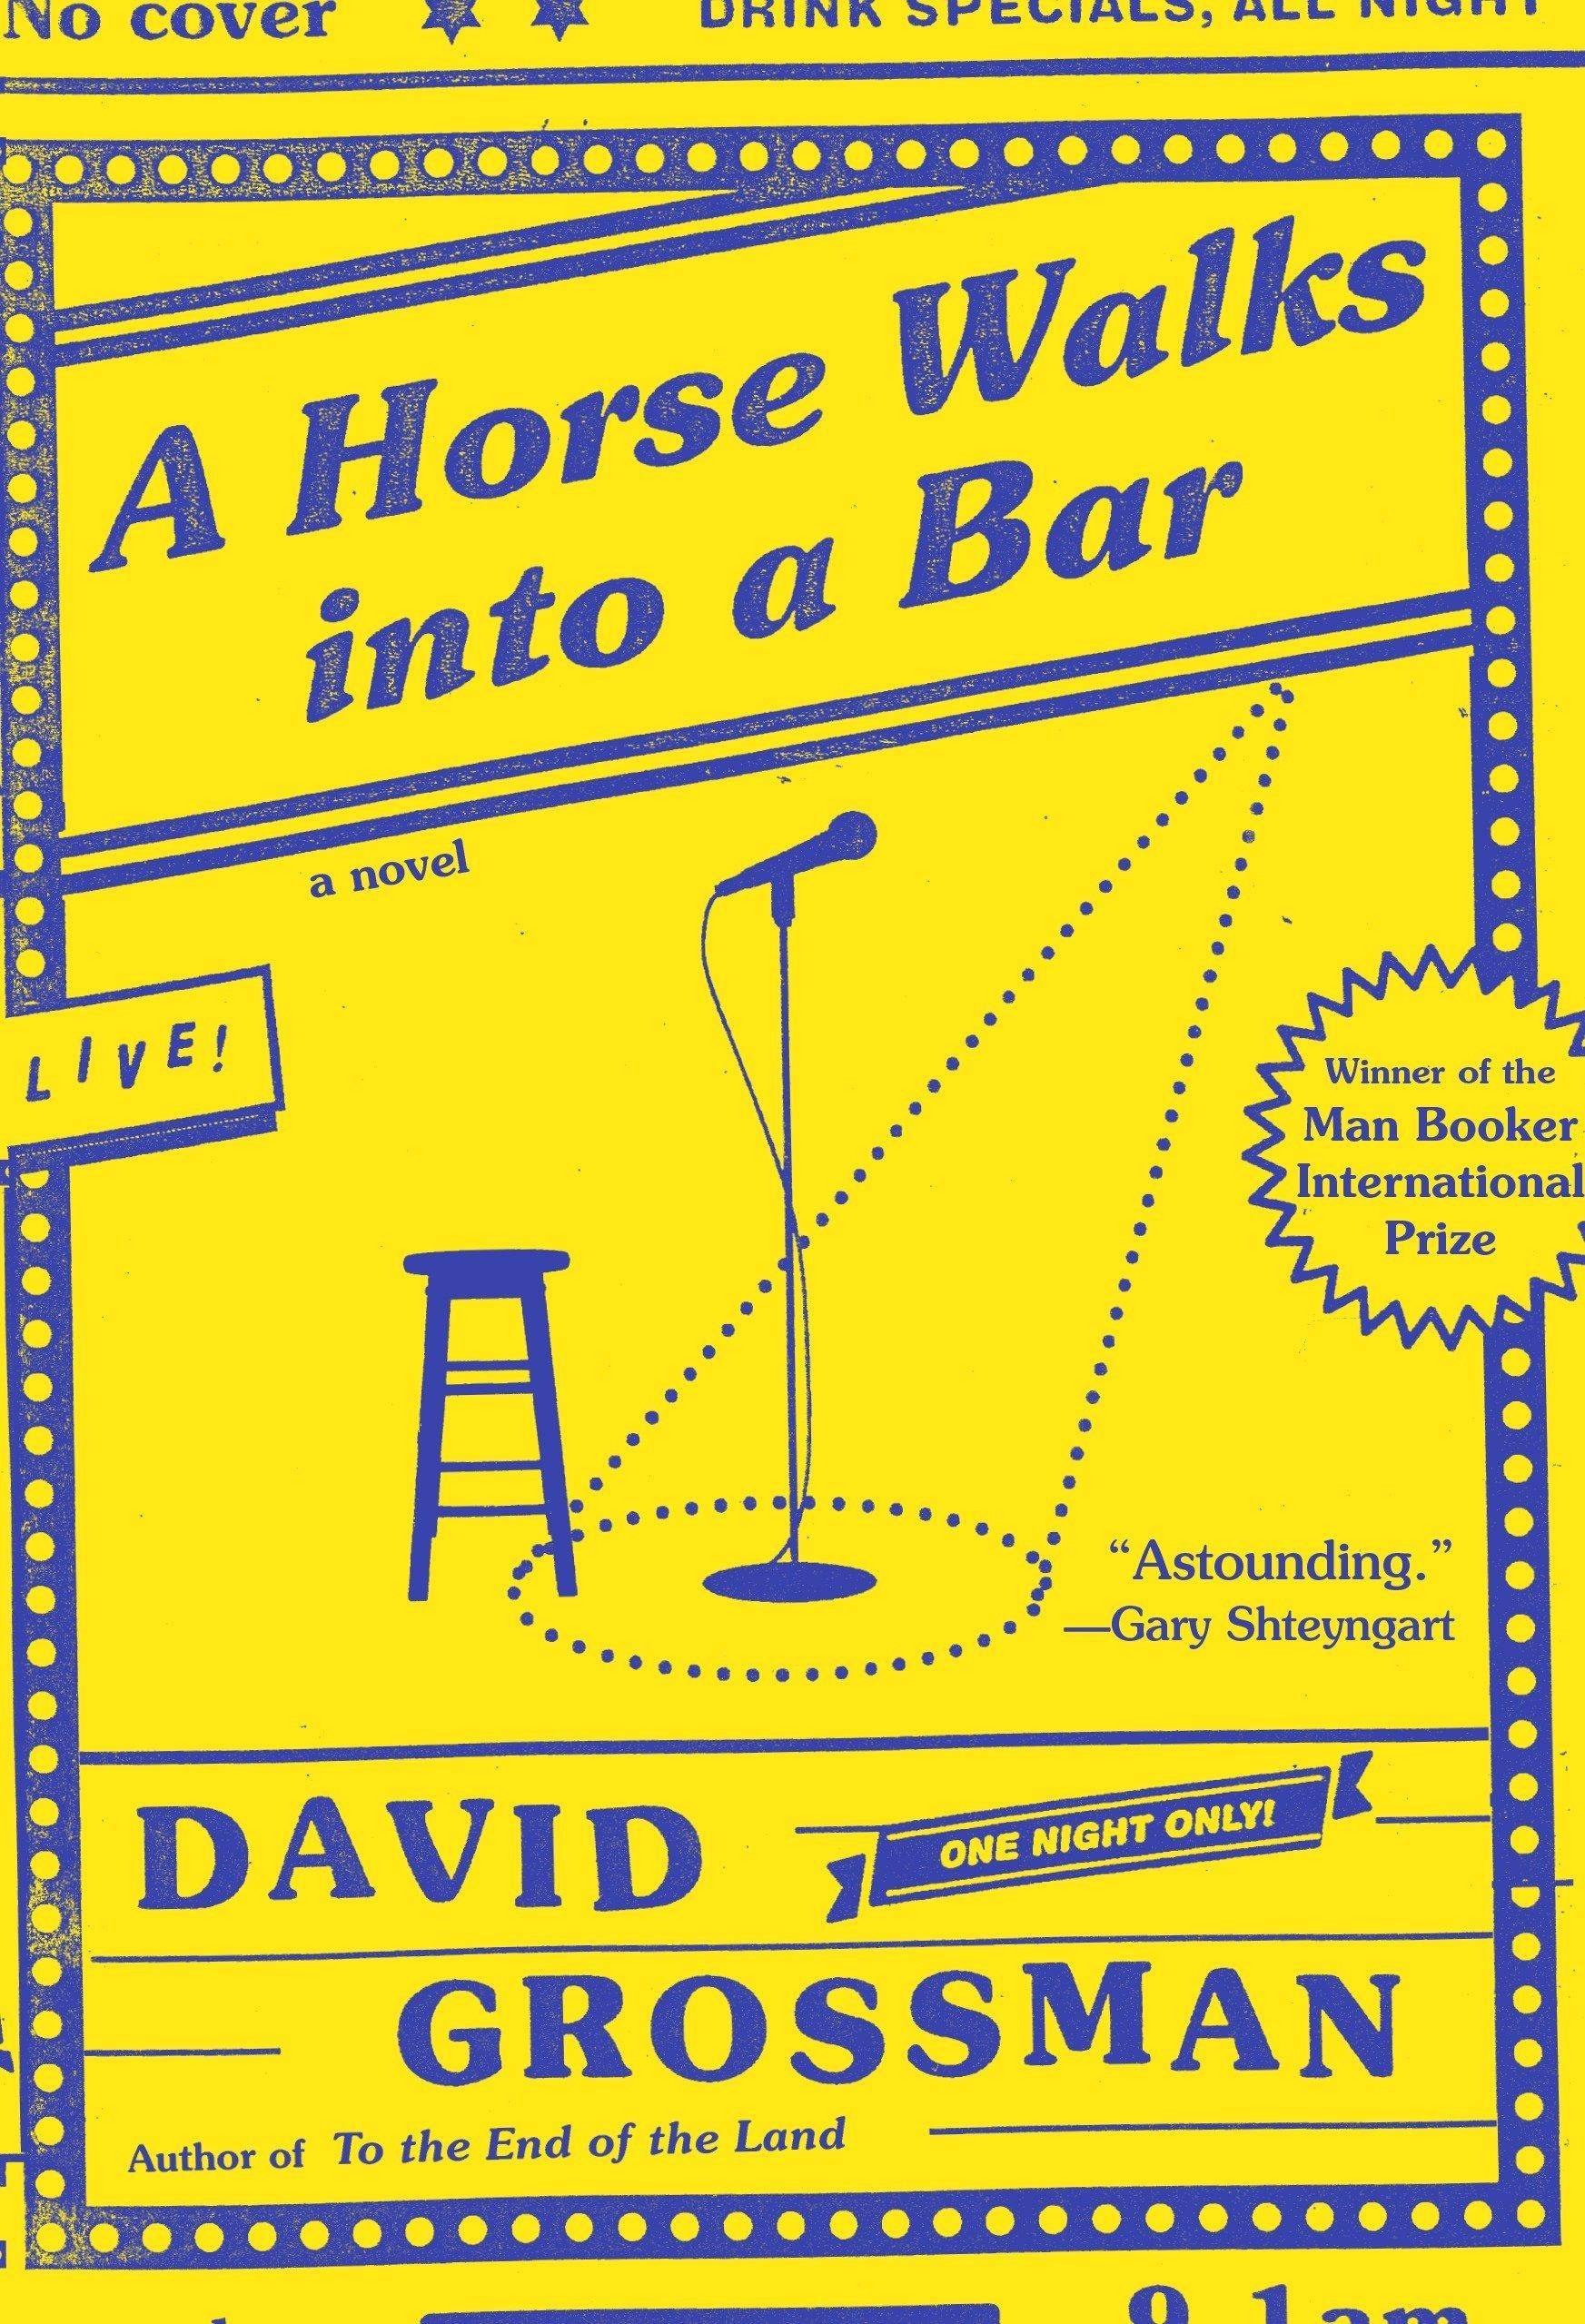 Amazon.com: A Horse Walks Into A Bar: A Novel (9780451493972): David  Grossman, Jessica Cohen: Books